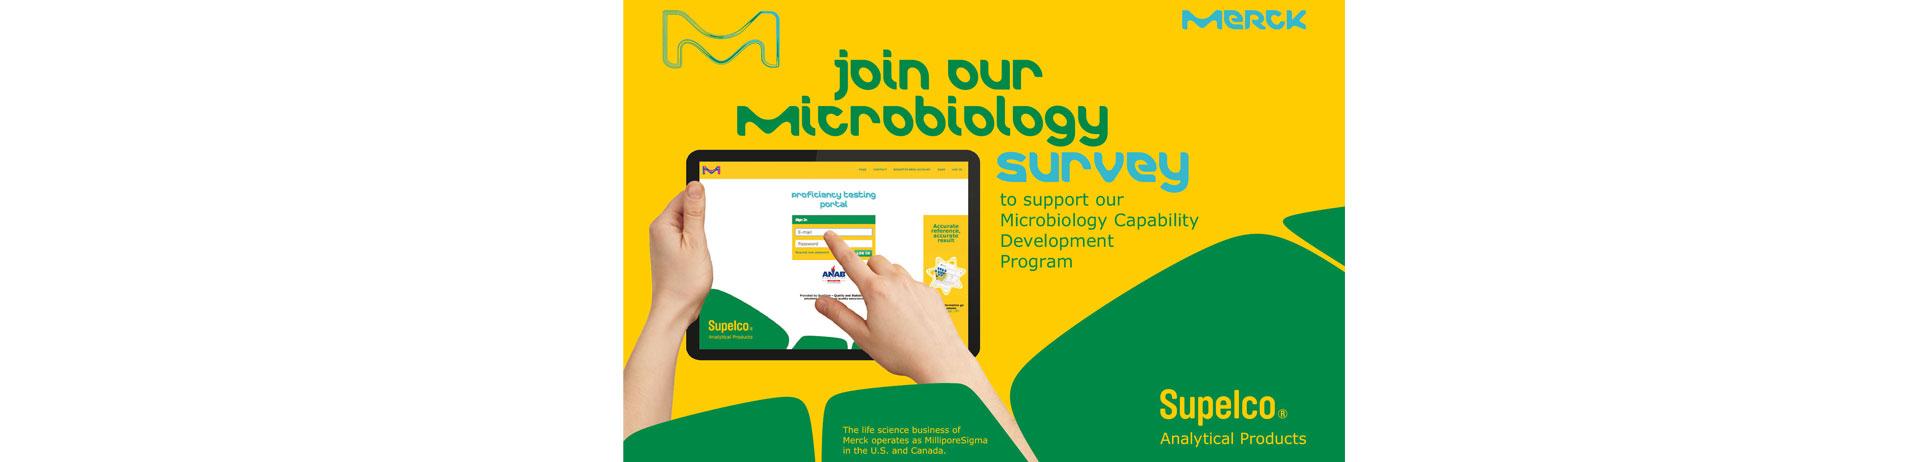 Microbiology Capability Development Program Proposal